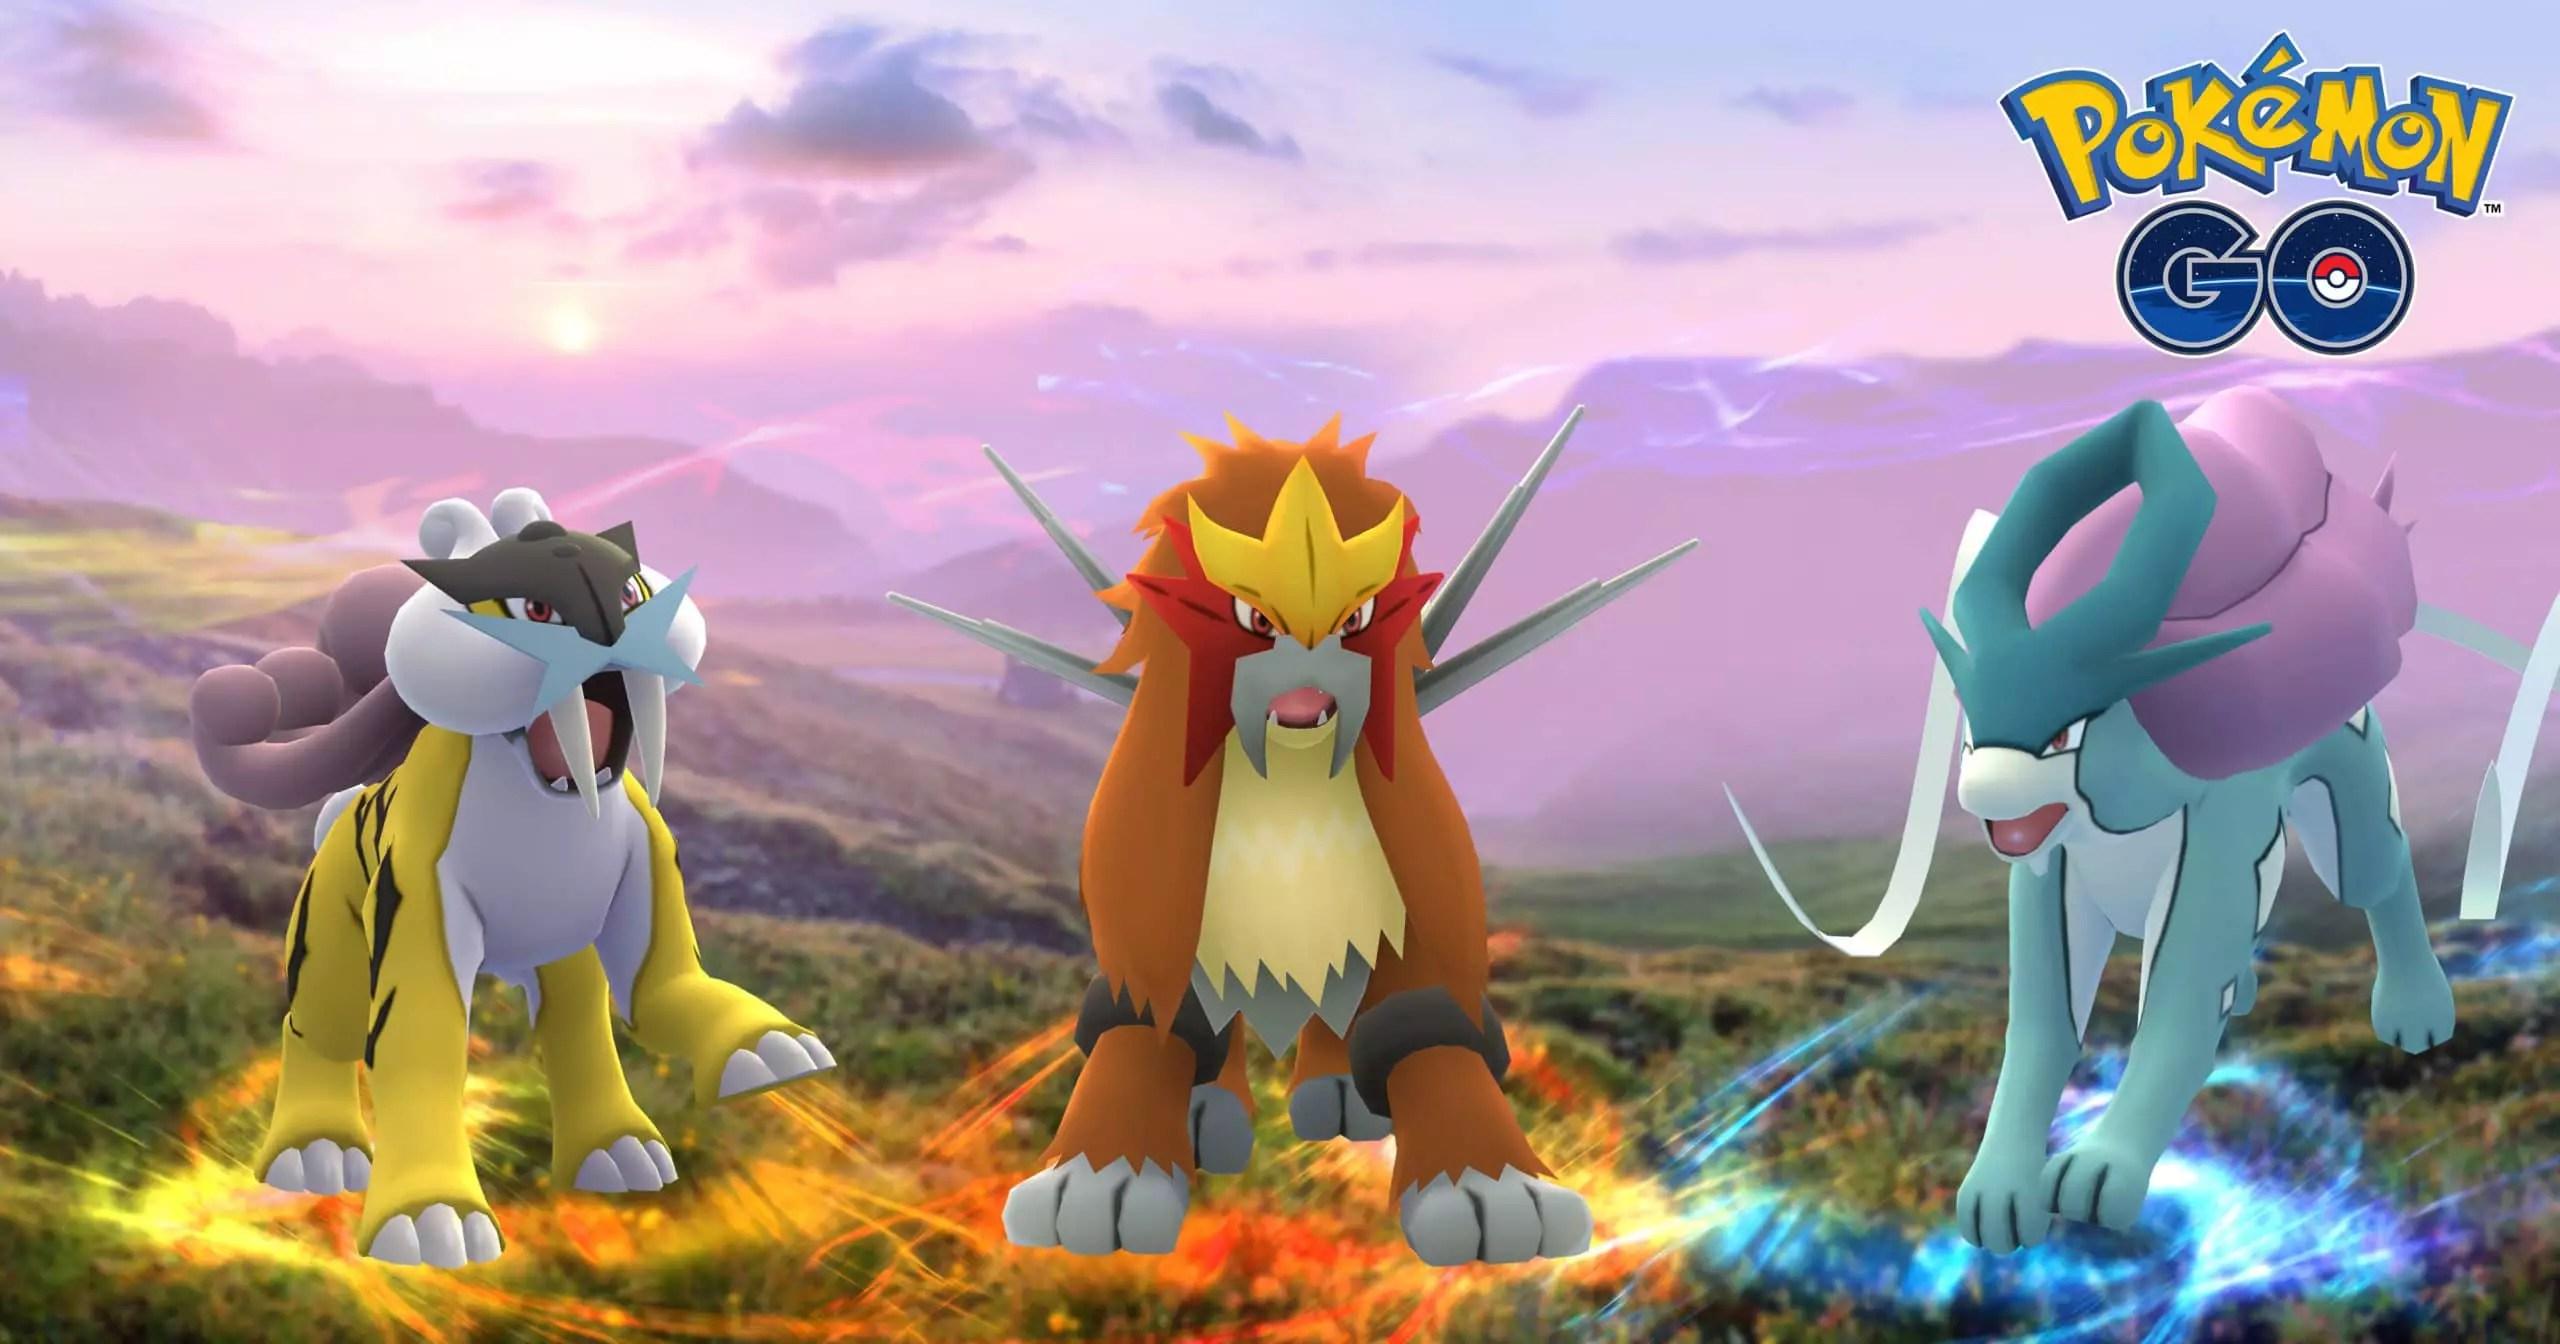 Pokémon Go Hits the $3.6 Billion Mark